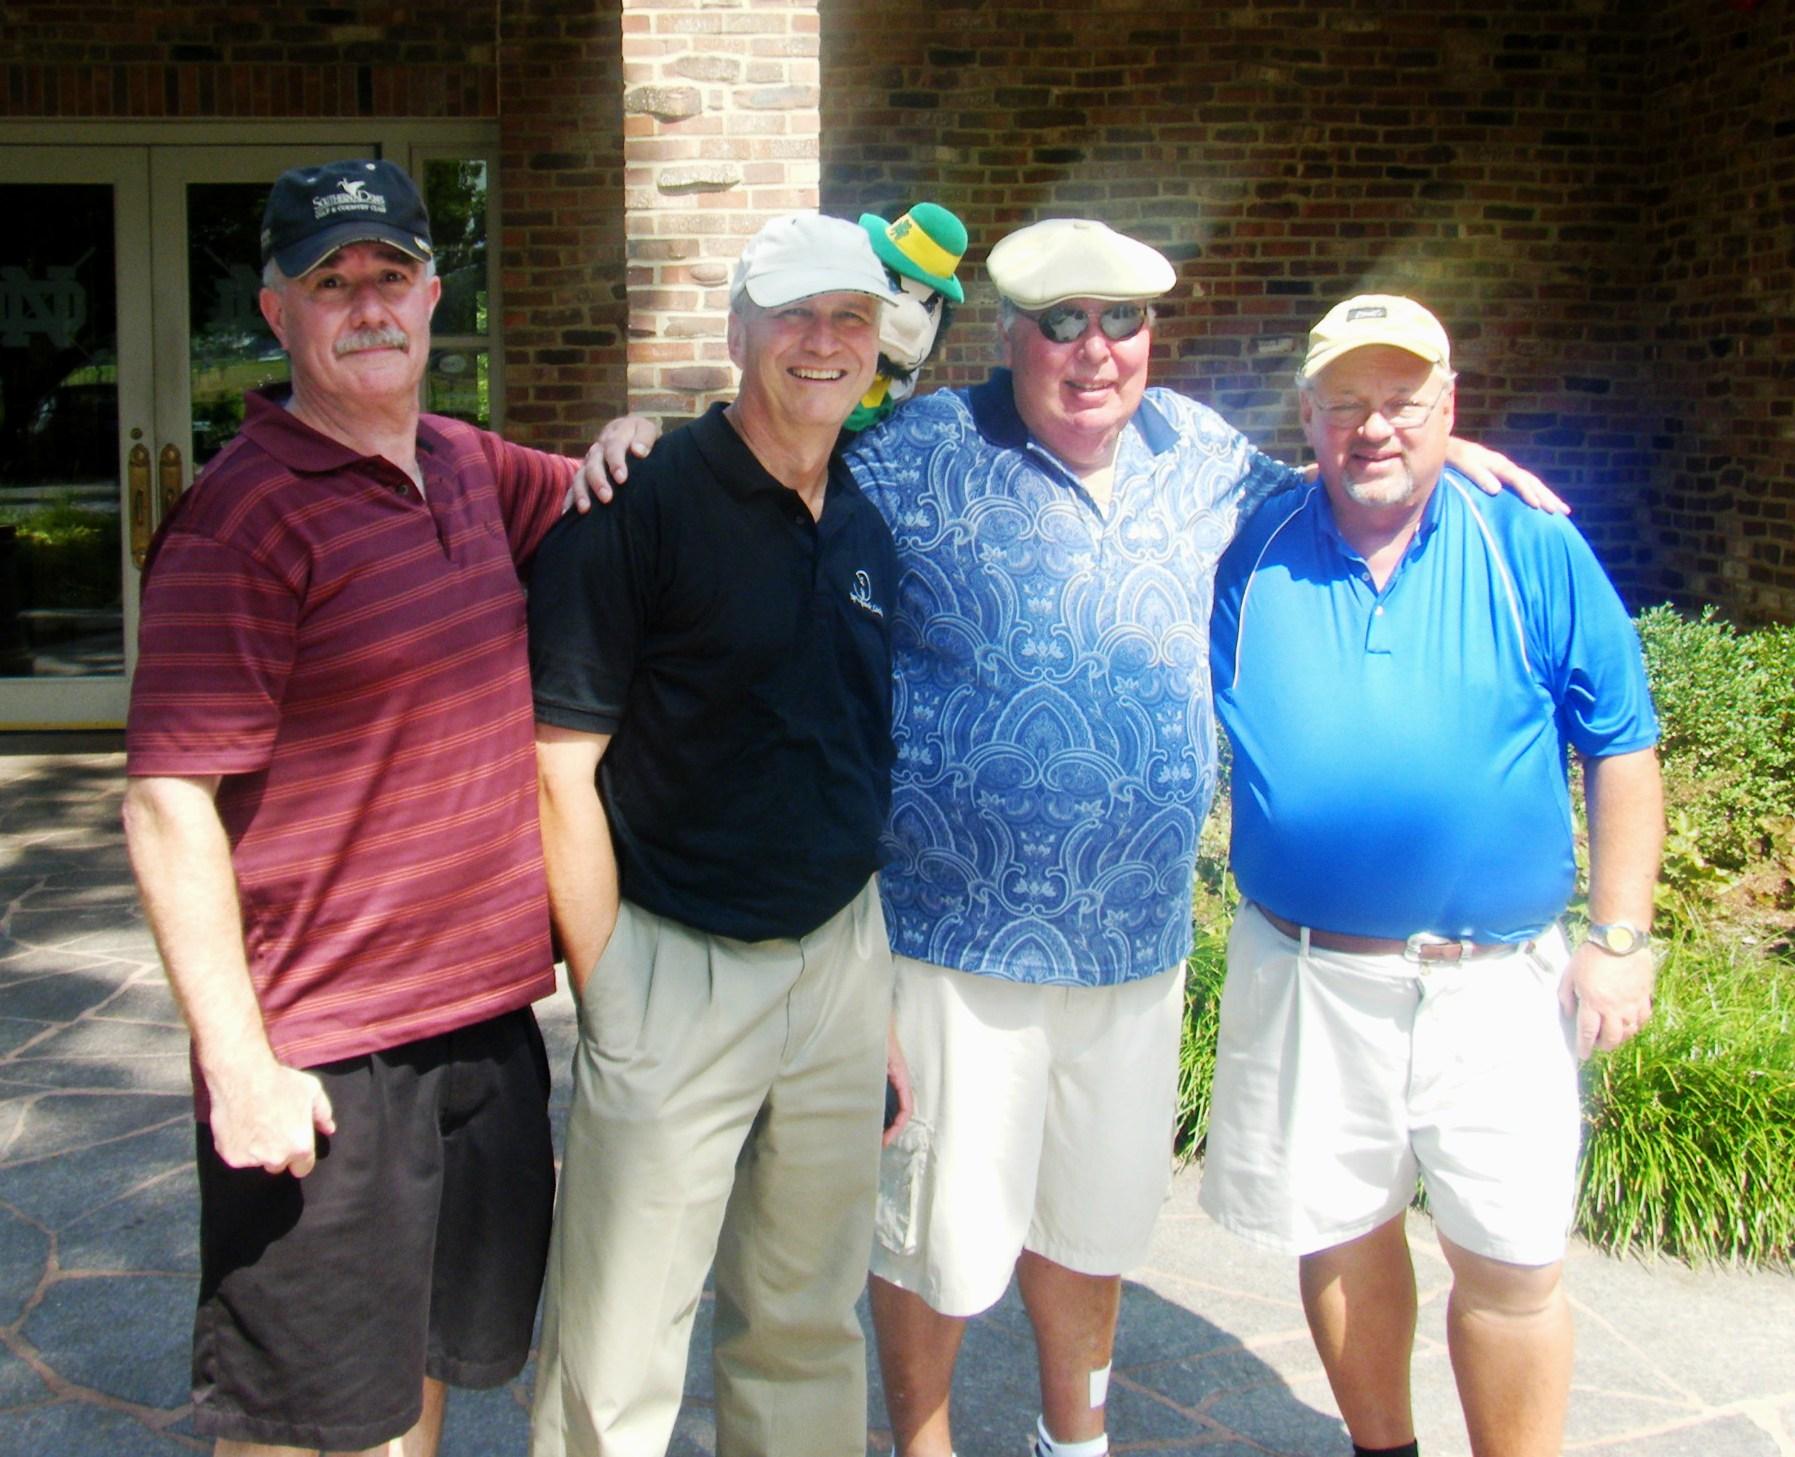 Fall 2010: Jack Gilmour, Doug Lubbers, Jack Burkhardt, Ken Castrop